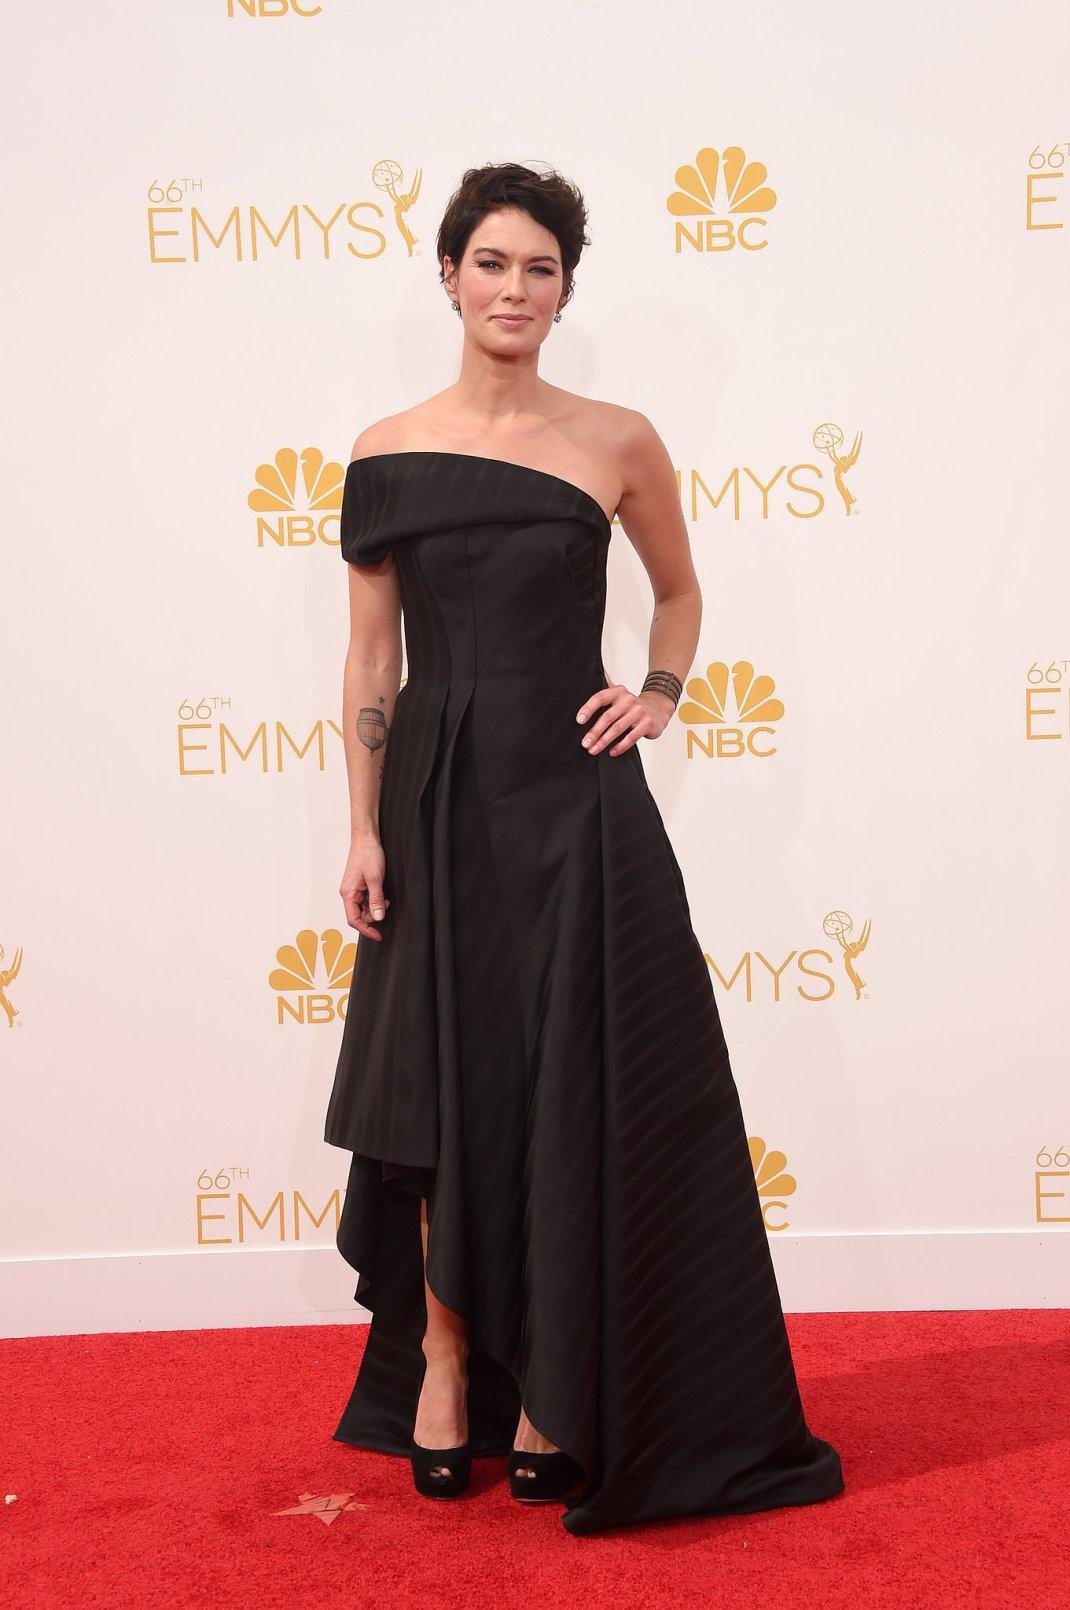 Lena-Headey-2014-Emmy-Awards